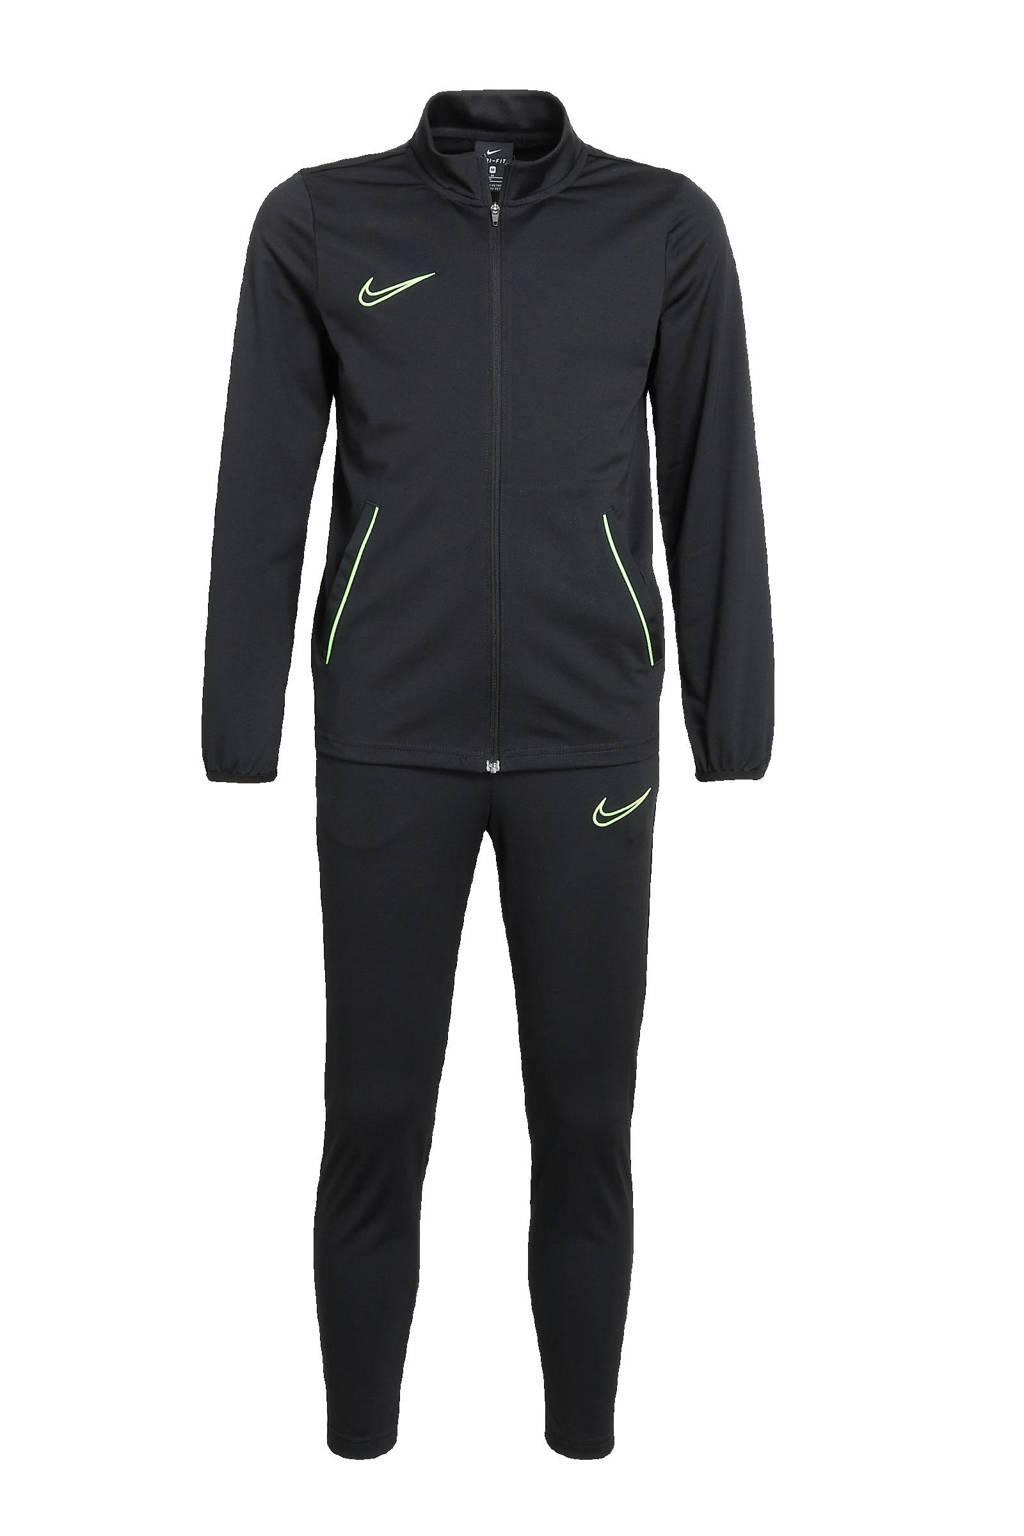 Nike   trainingspak zwart/felgroen